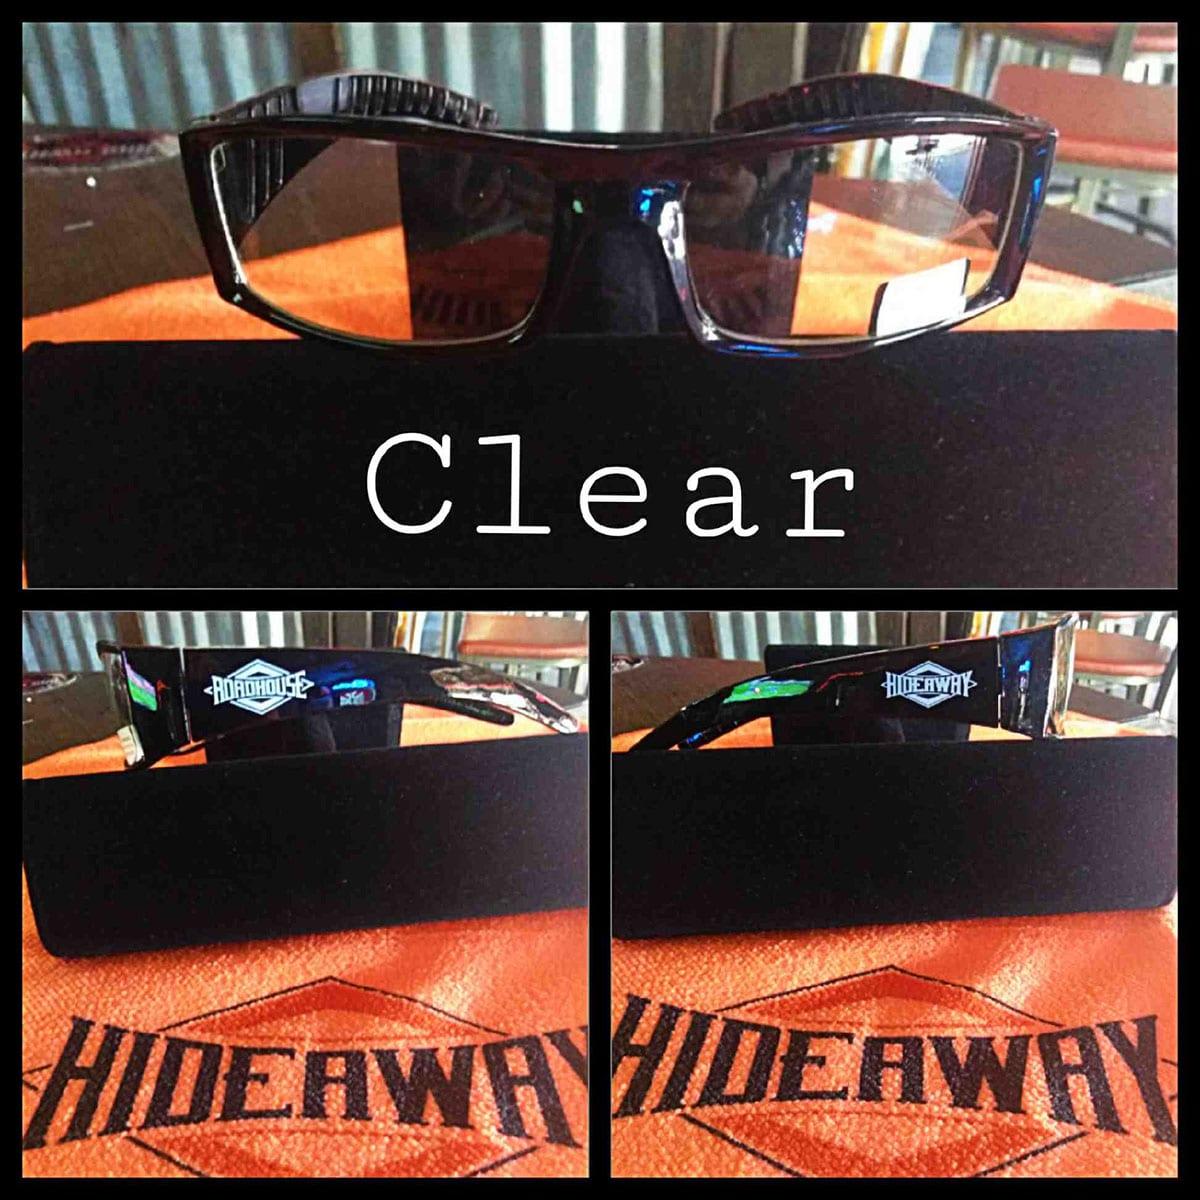 Roadhouse / Hideaway Glasses - Clear Lenses